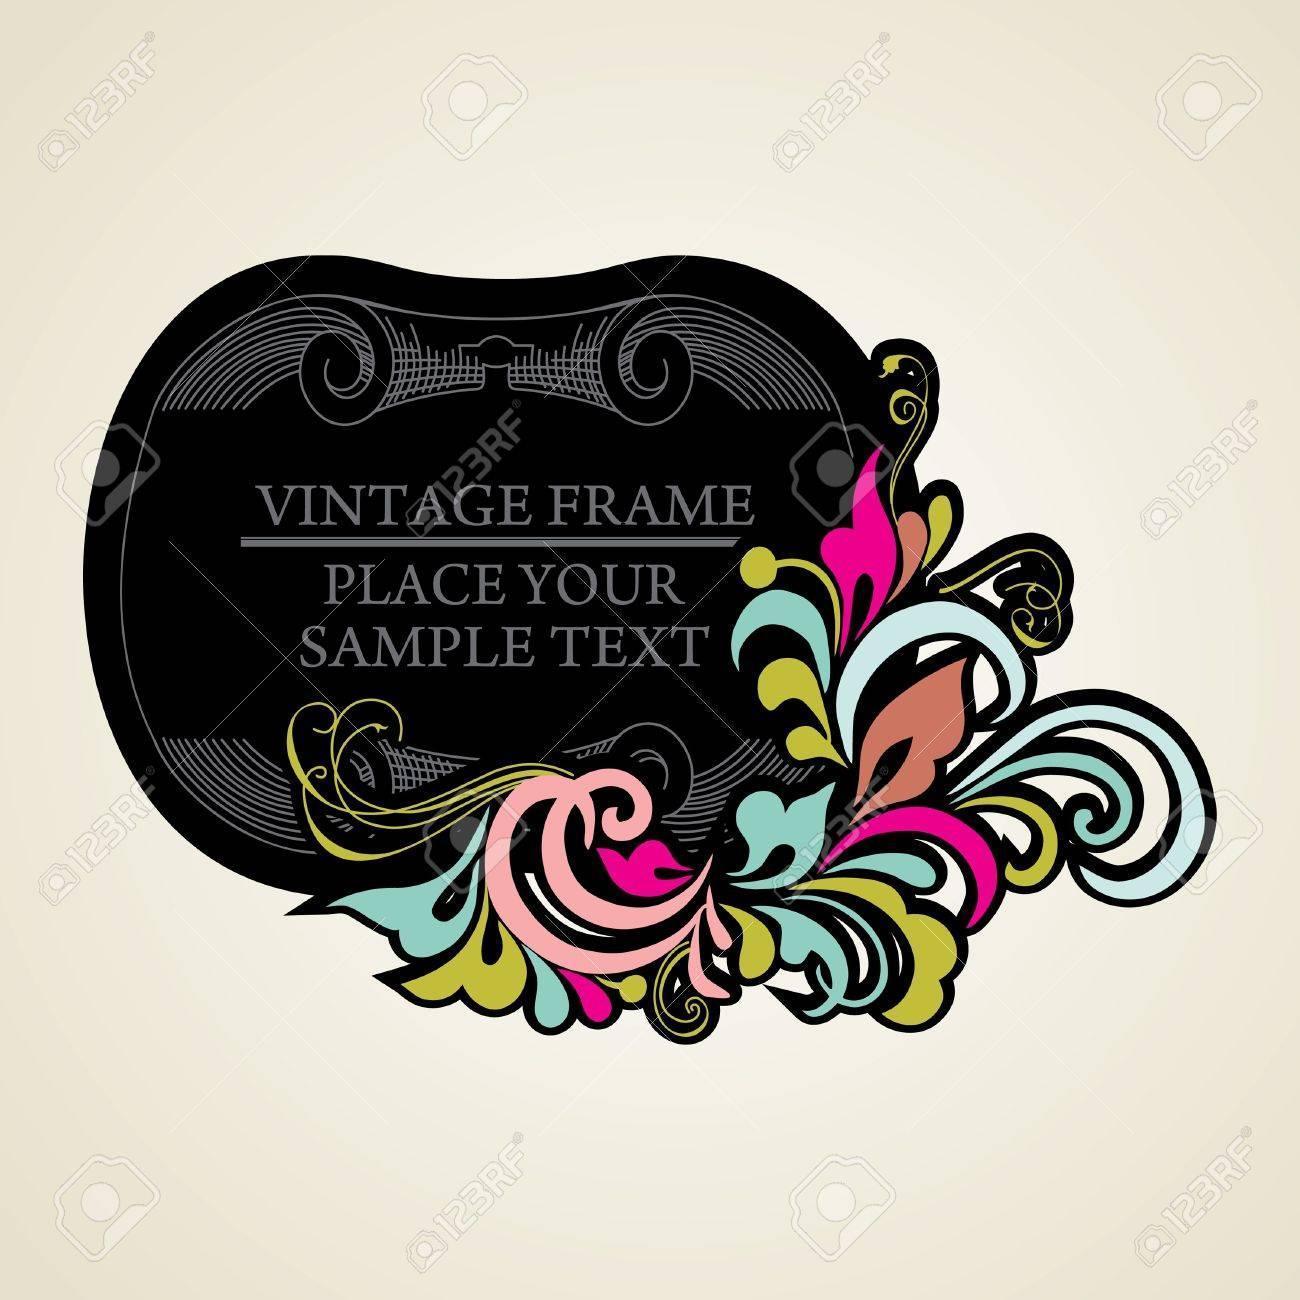 Elegance vintage frames for your text Stock Vector - 13564696